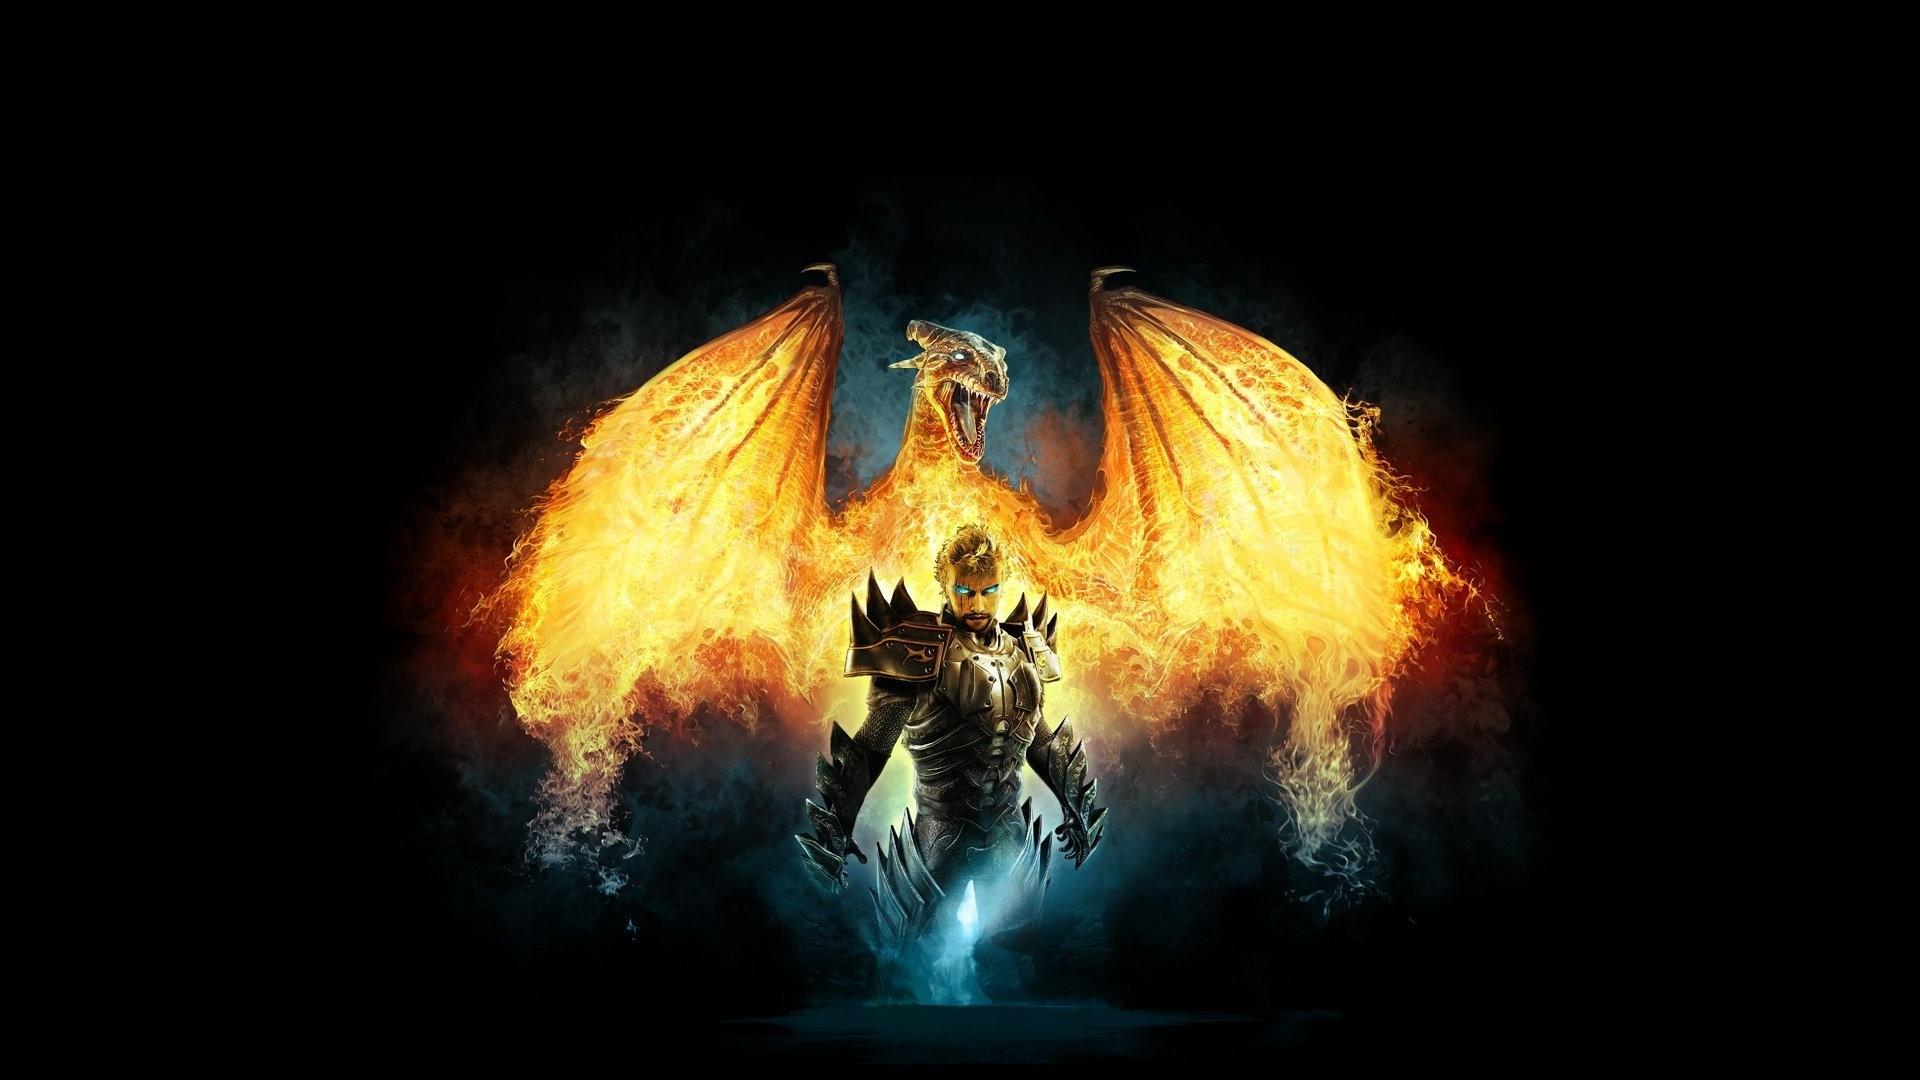 Fire Dragon   Dragon on Fire Wallpaper   HD   Wallpapers